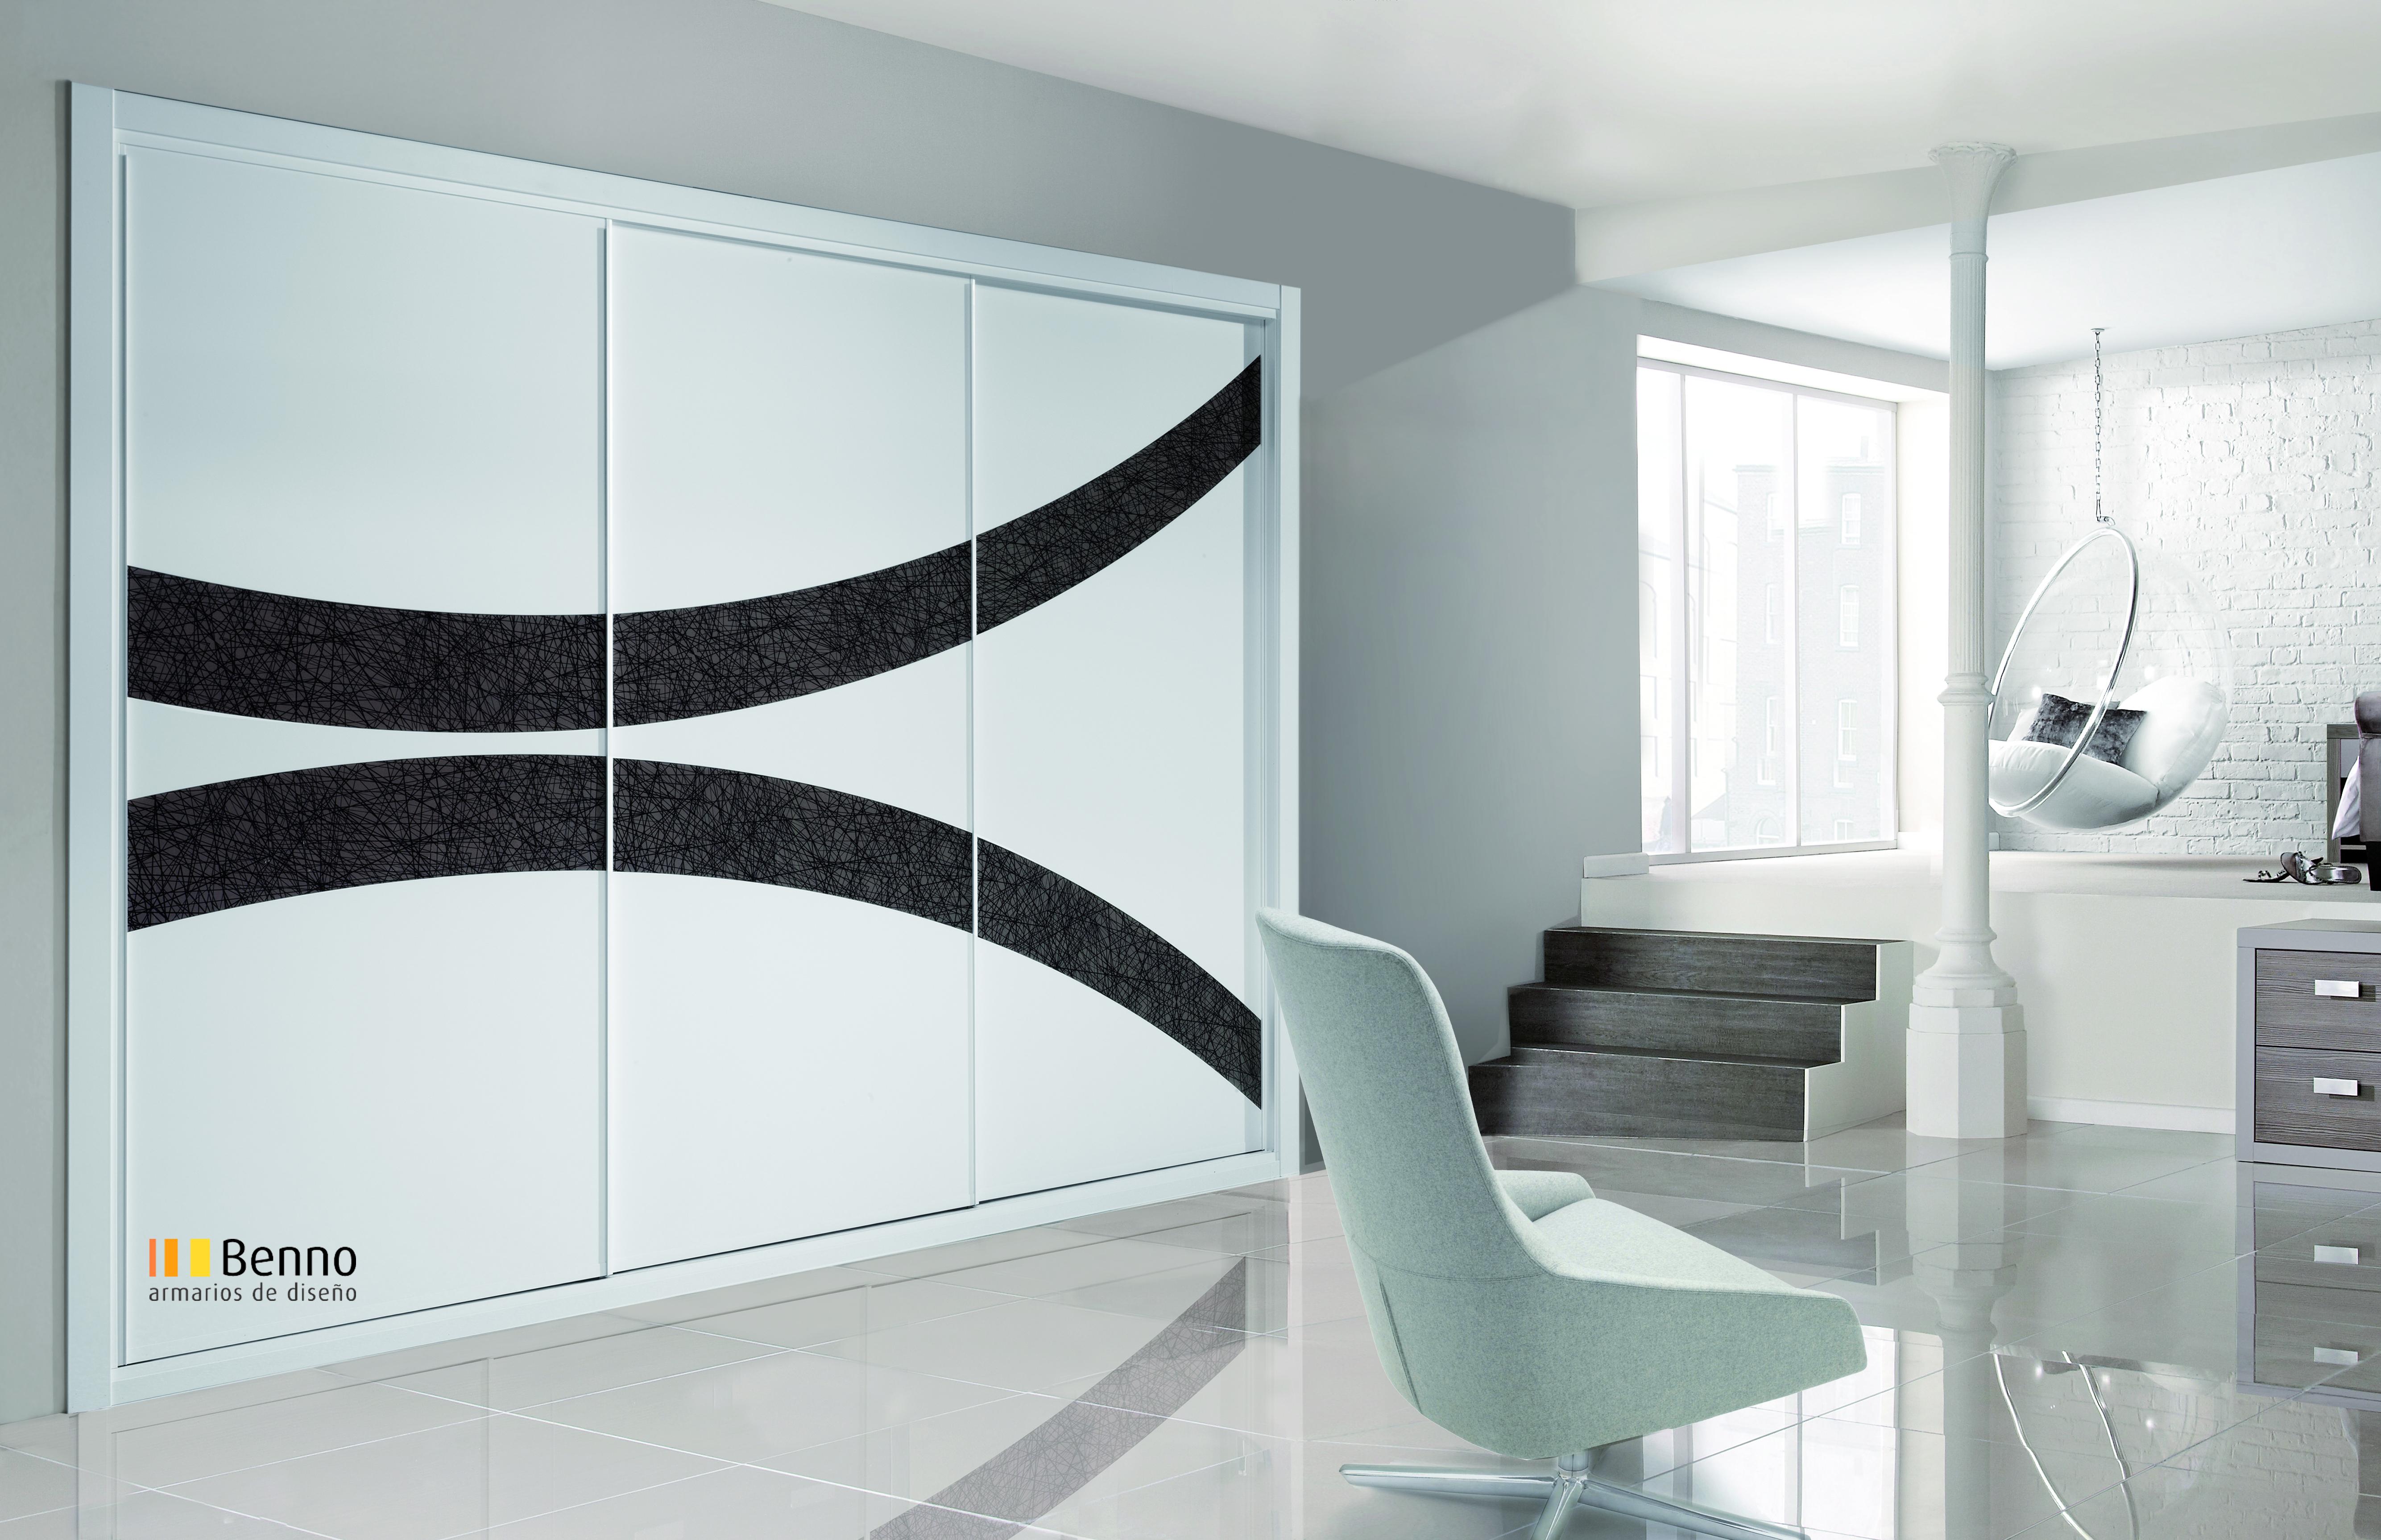 Comprar armarios baratos madrid exposici n armarios modernos for Puertas de armarios de cocina baratas